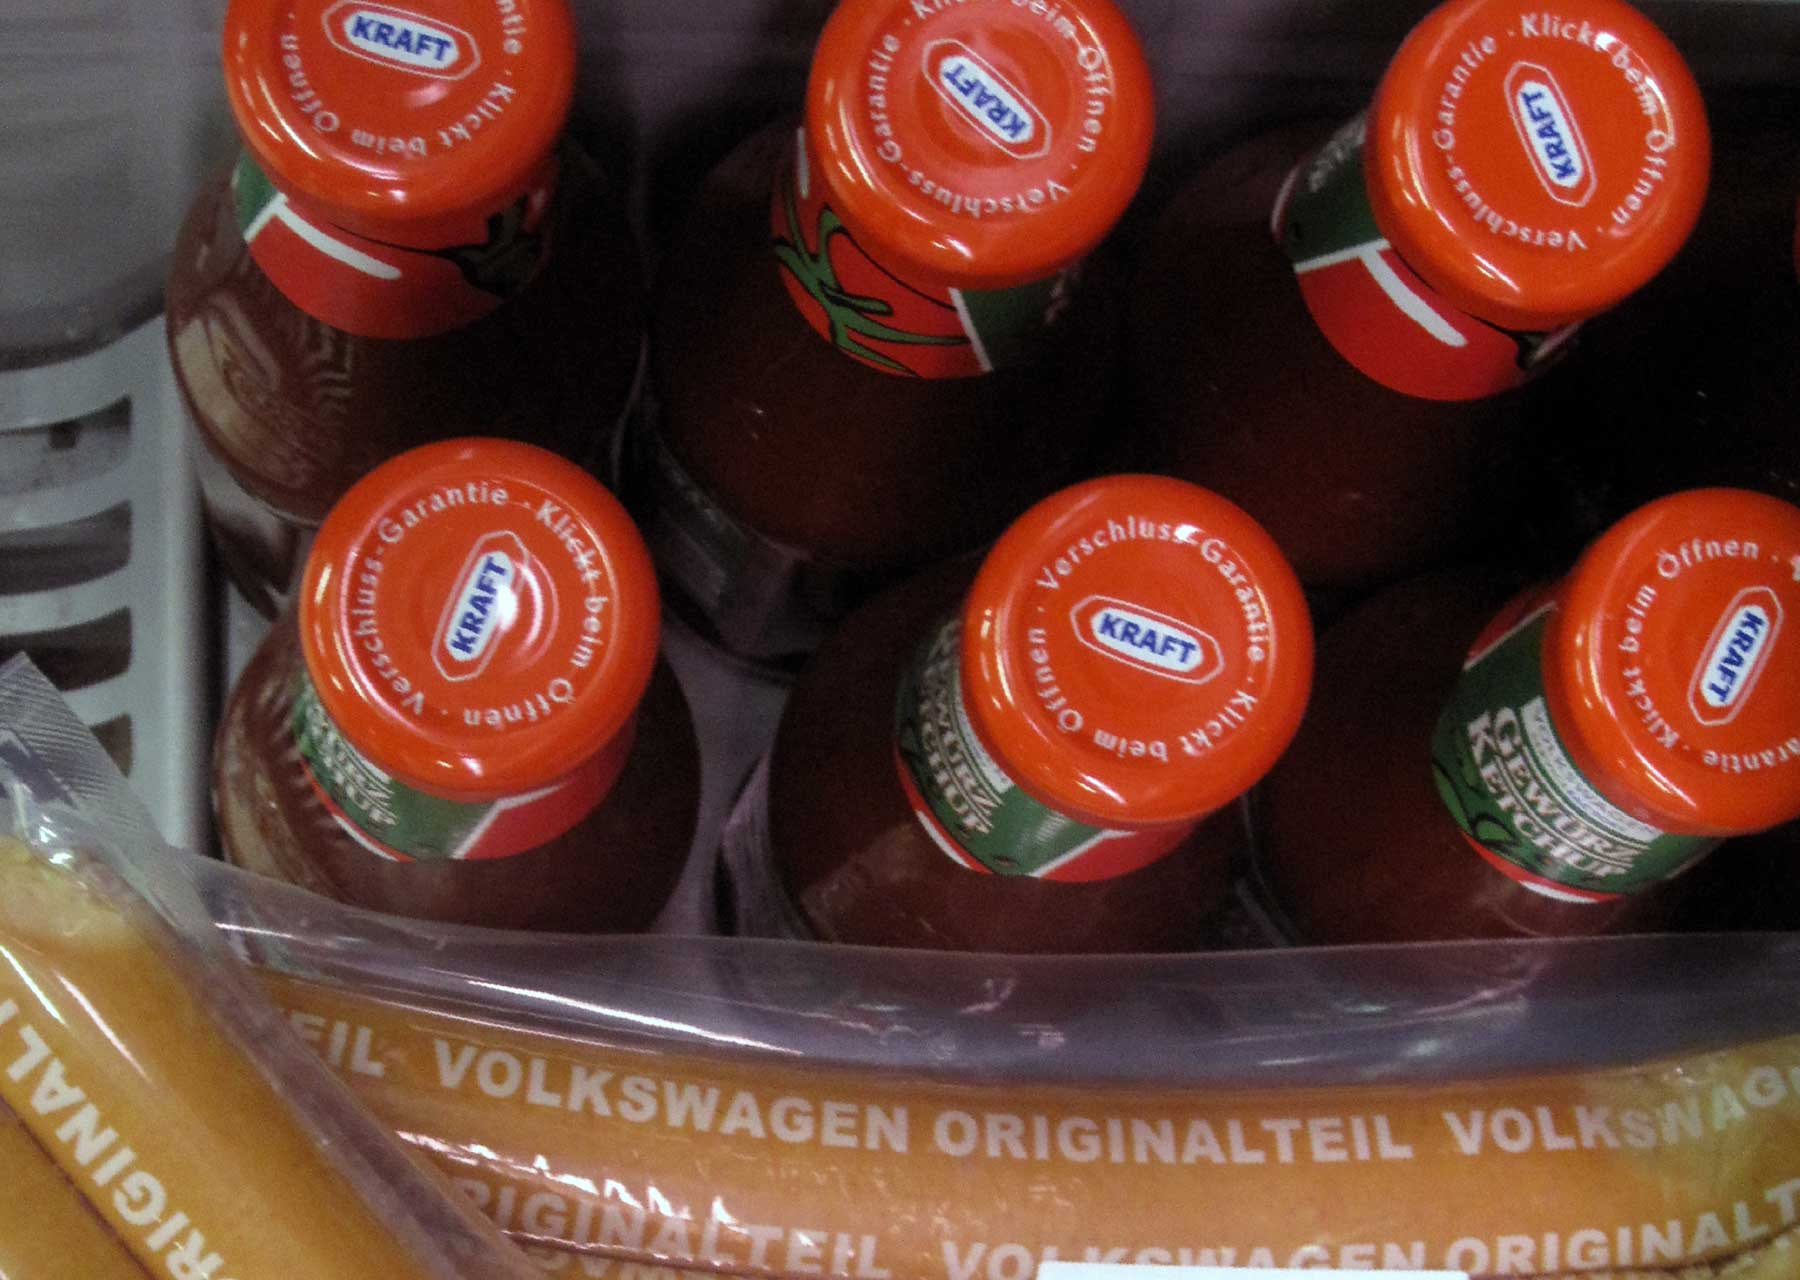 Volkswagen Ketchup jars showing Kraft name on lids